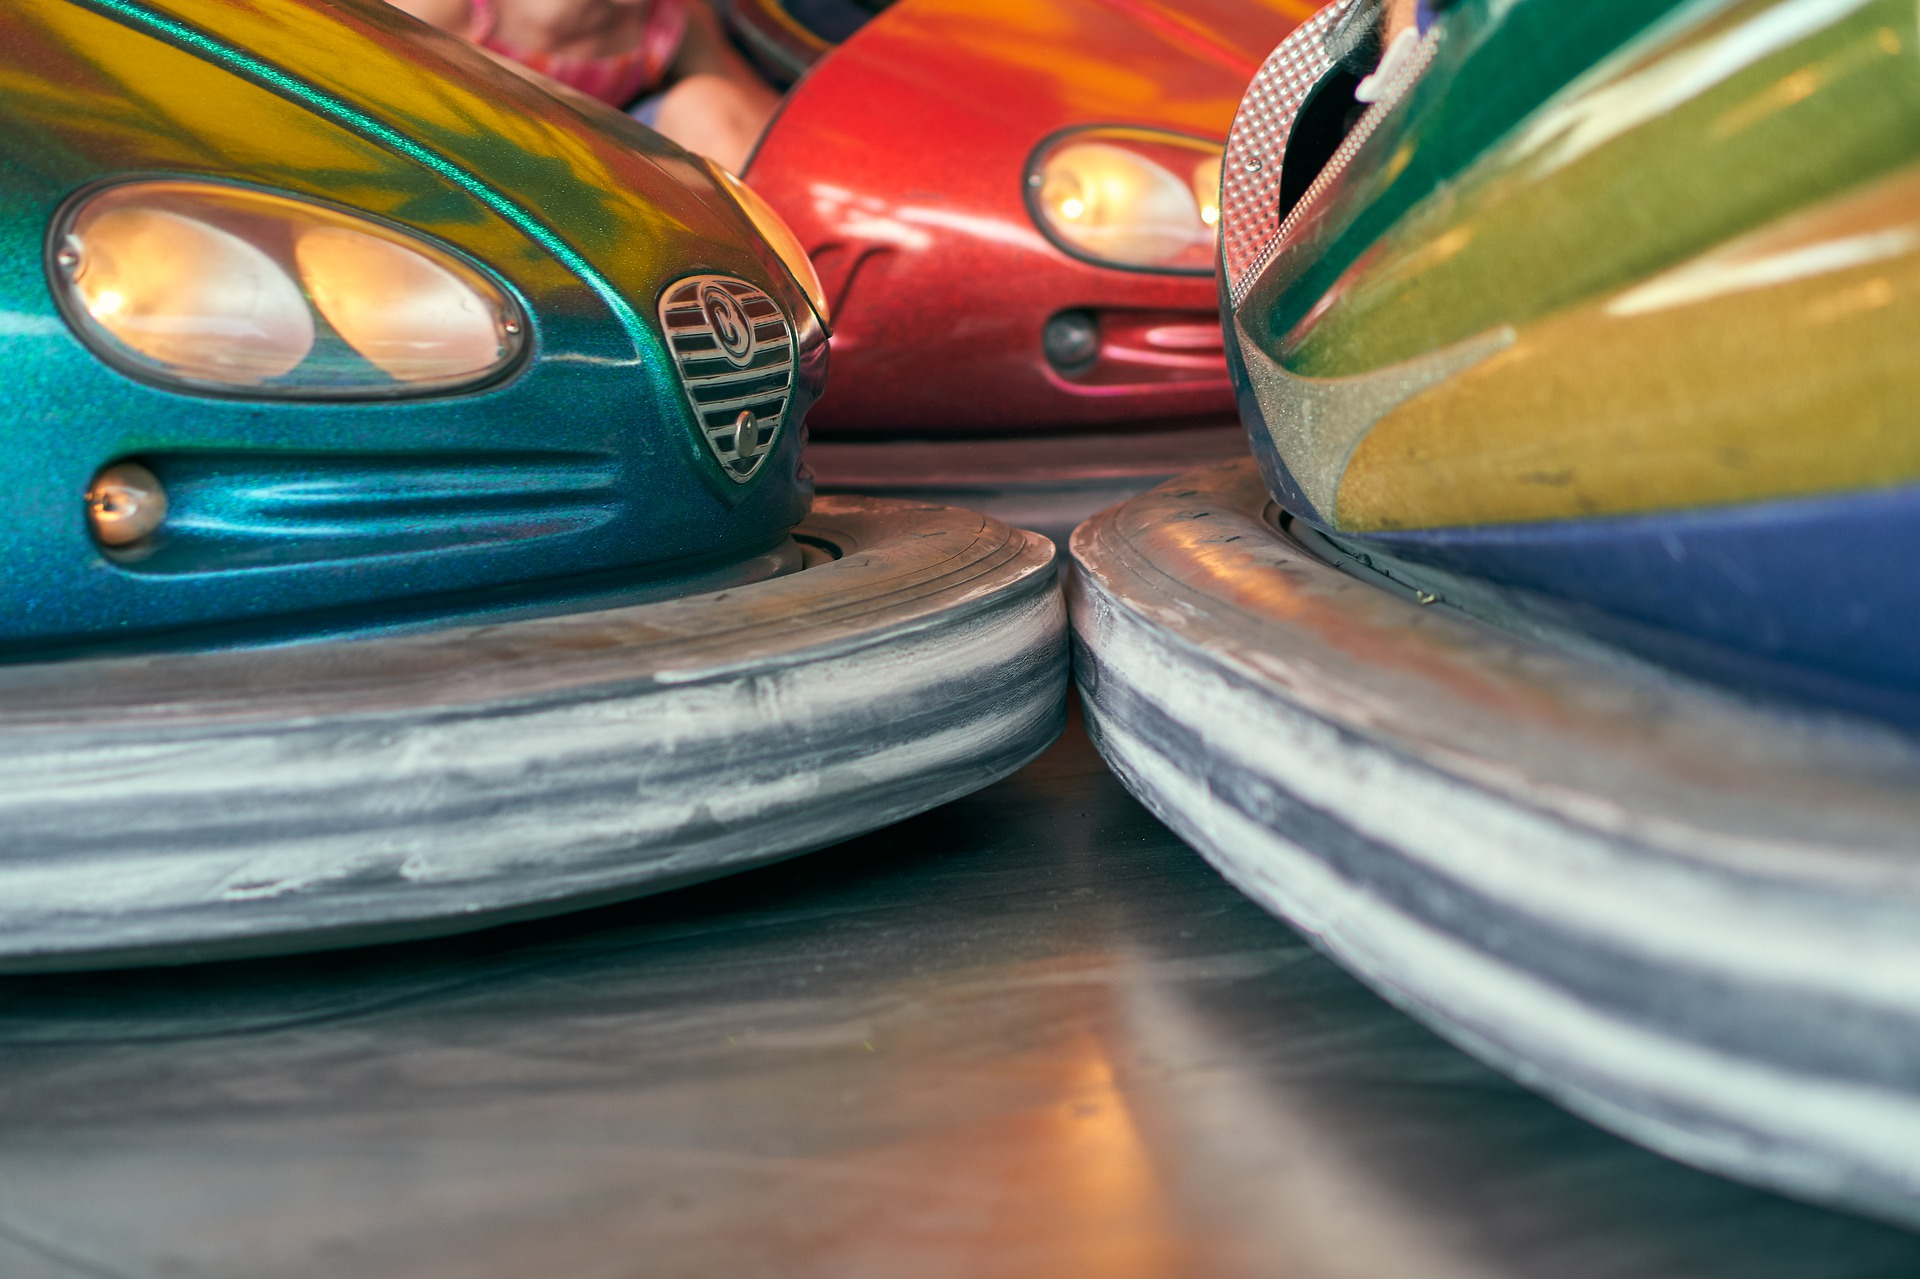 bumper-cars-4390958_1920